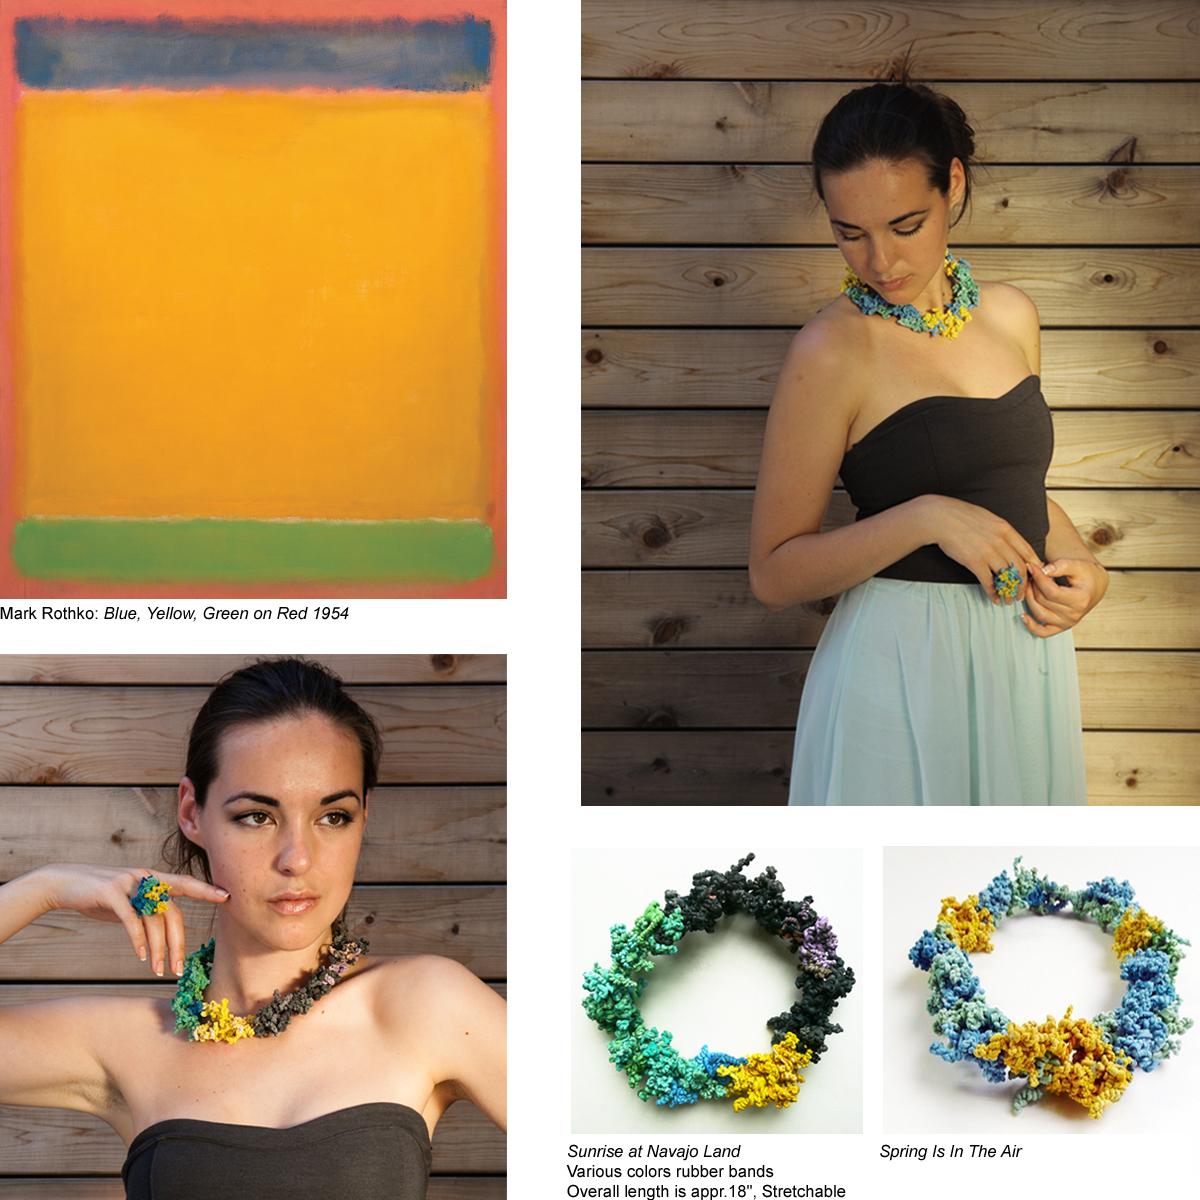 Rothko_Blue, Yellow, Green on Red_M2 .jpg